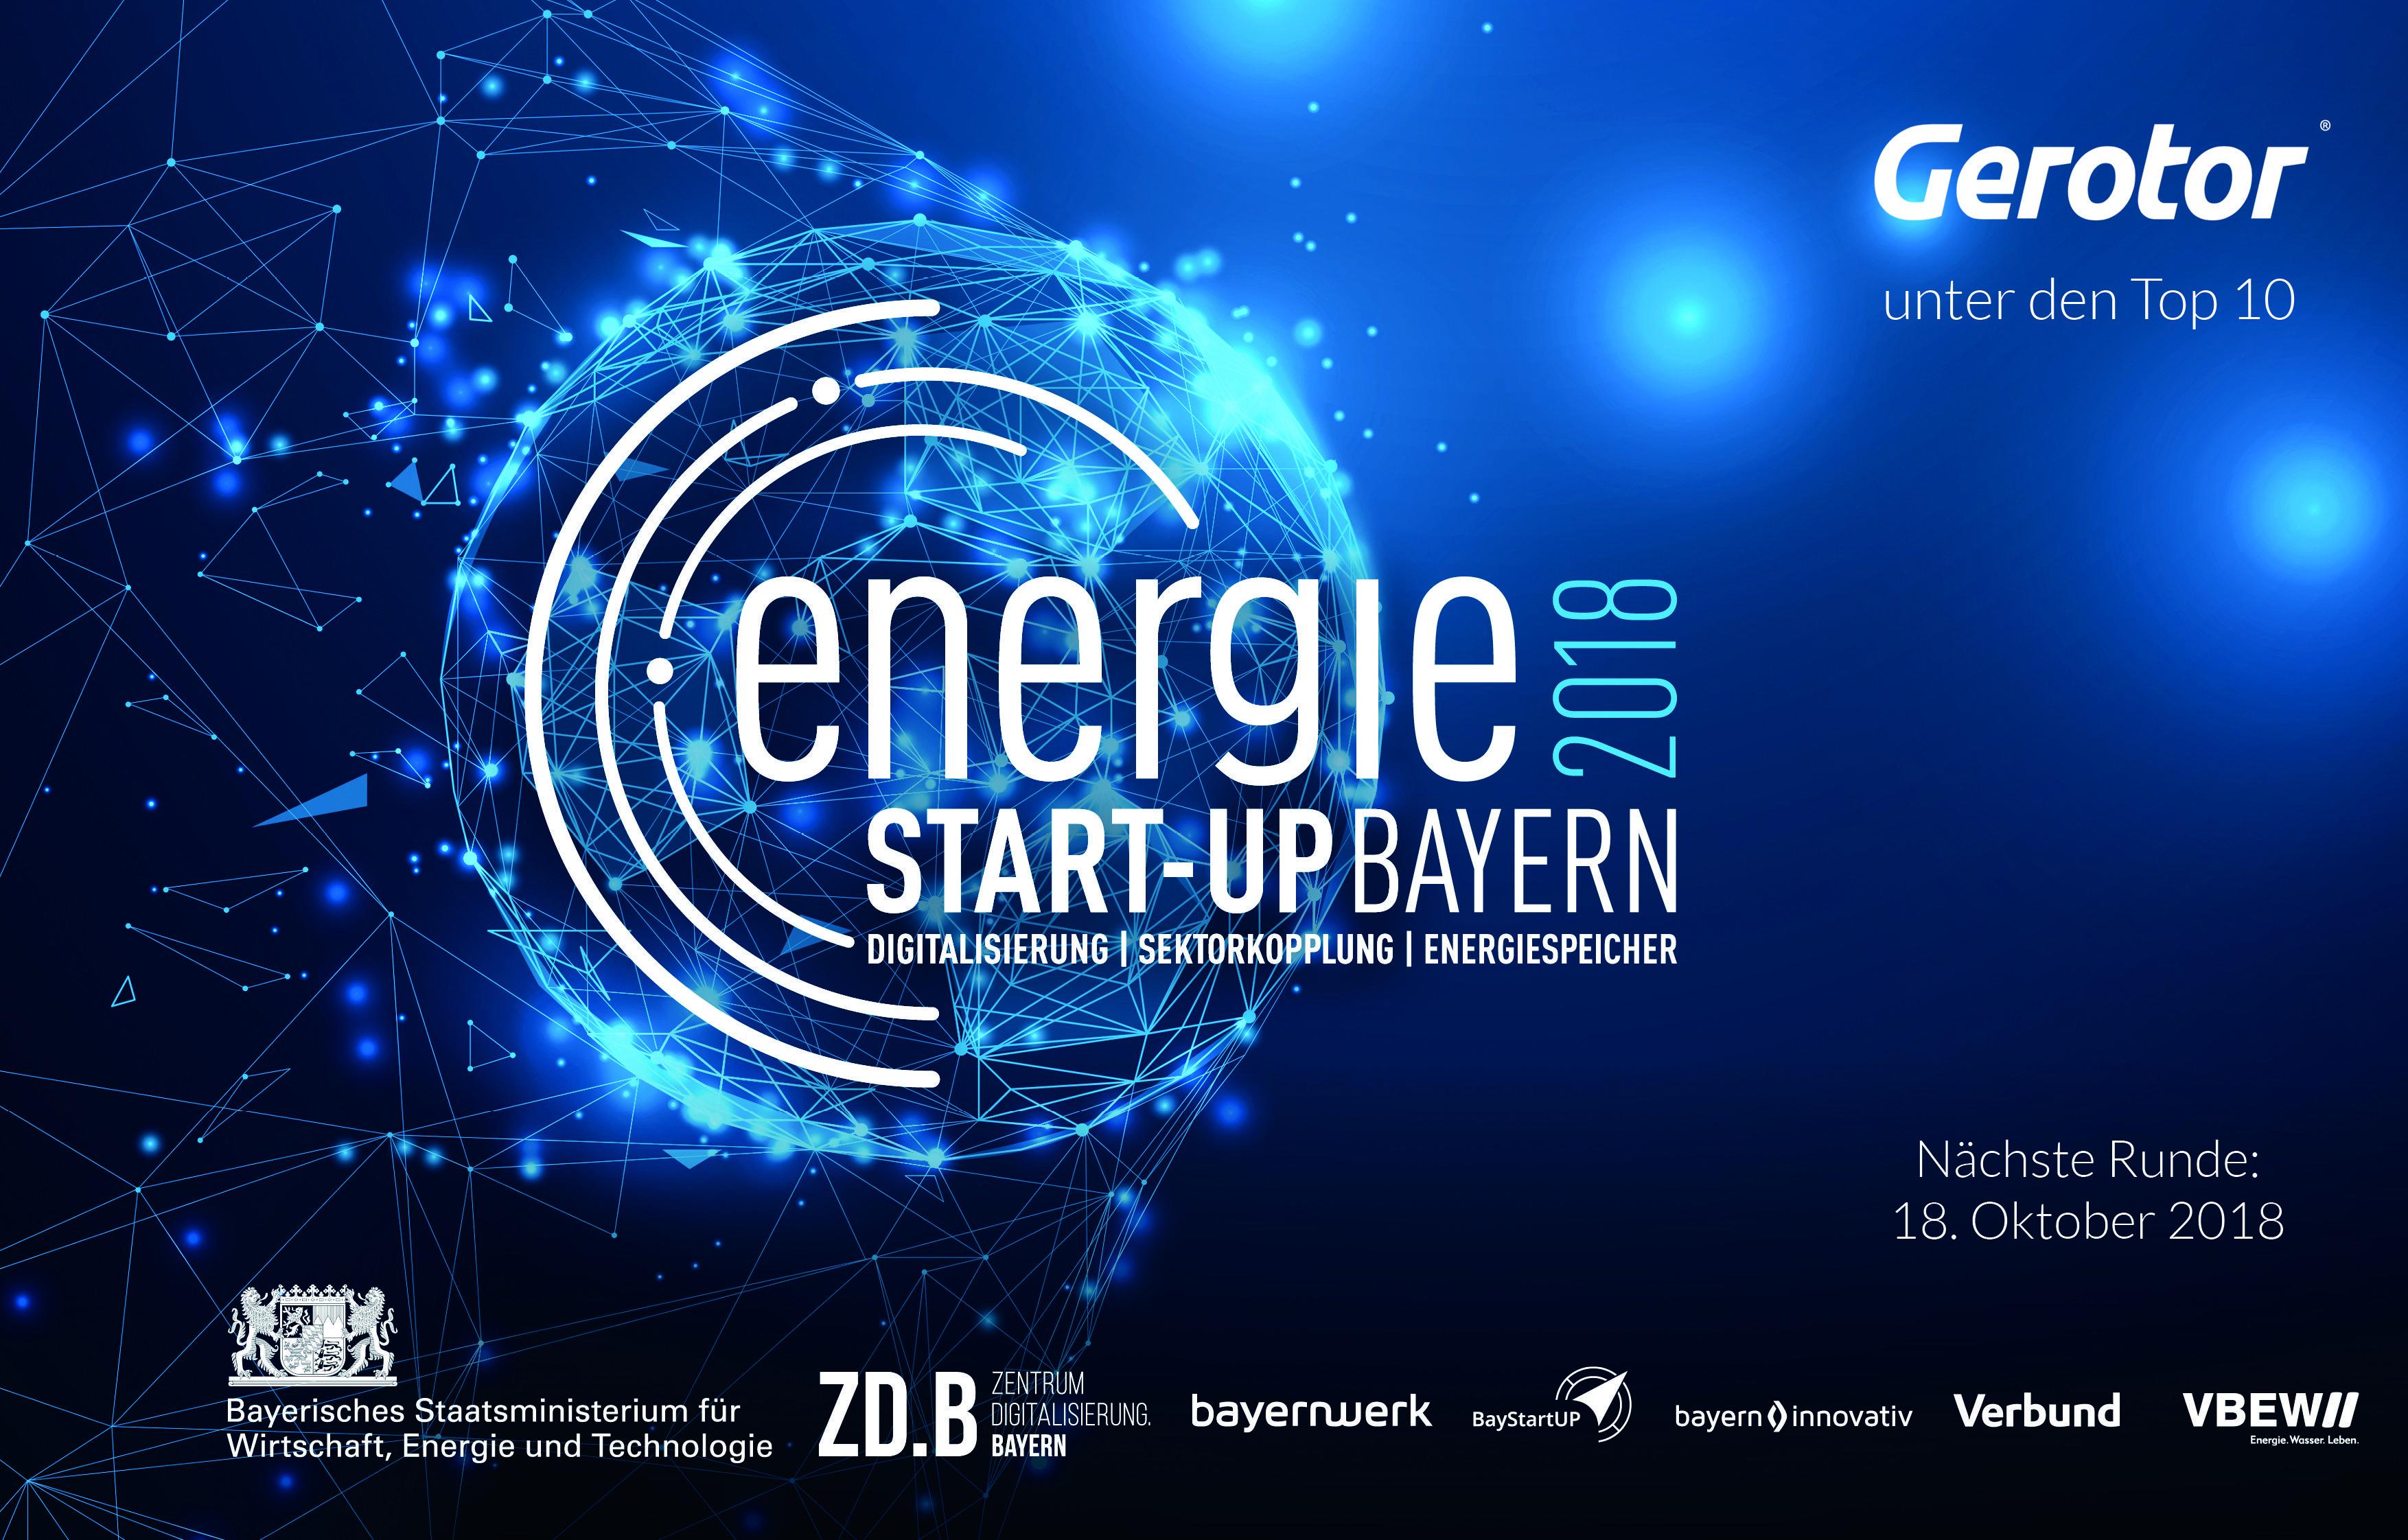 Top 10 Energie Startups Gerotor